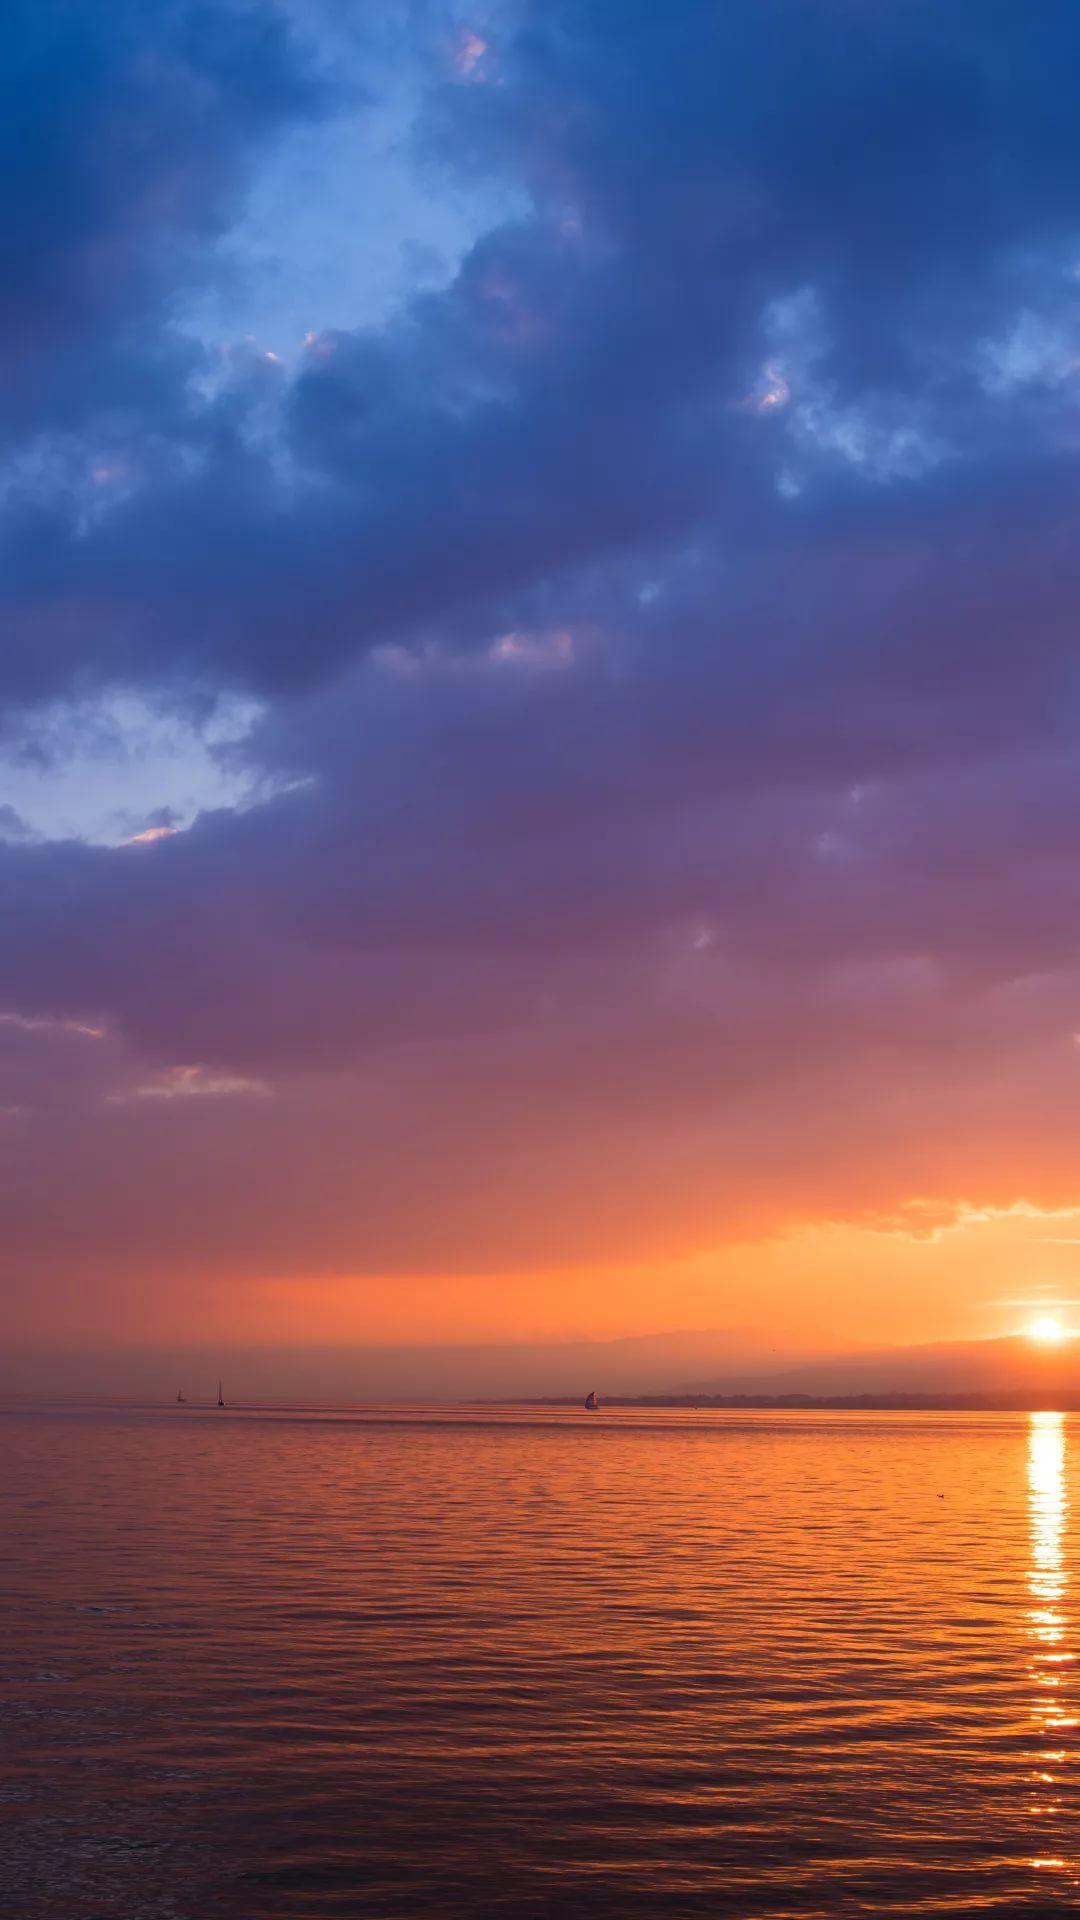 Beautiful Sunset home screen wallpaper